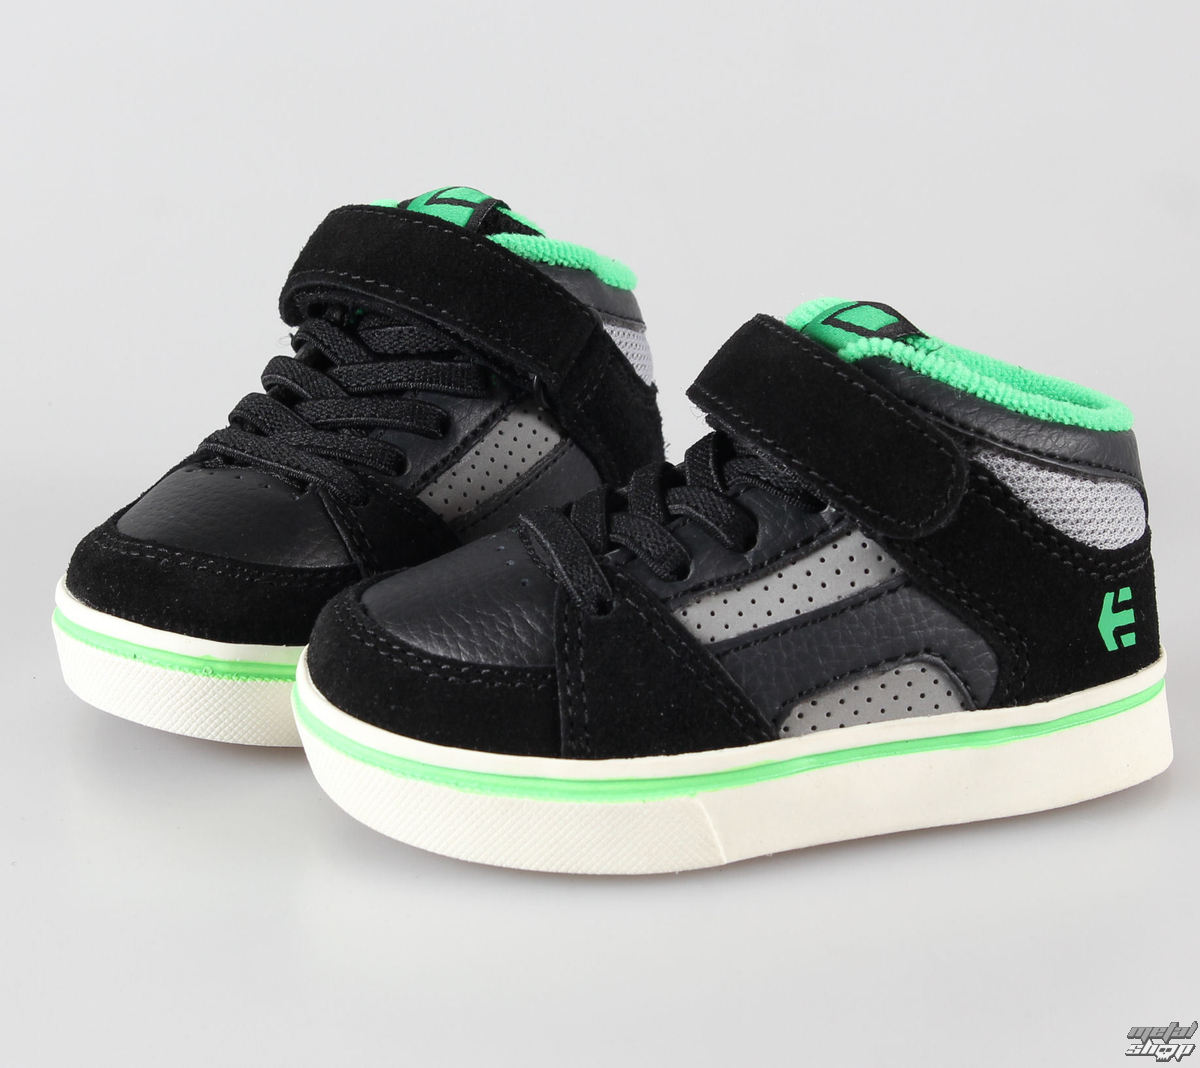 topánky detské ETNIES - Toddler RVM Strap - Black / Green